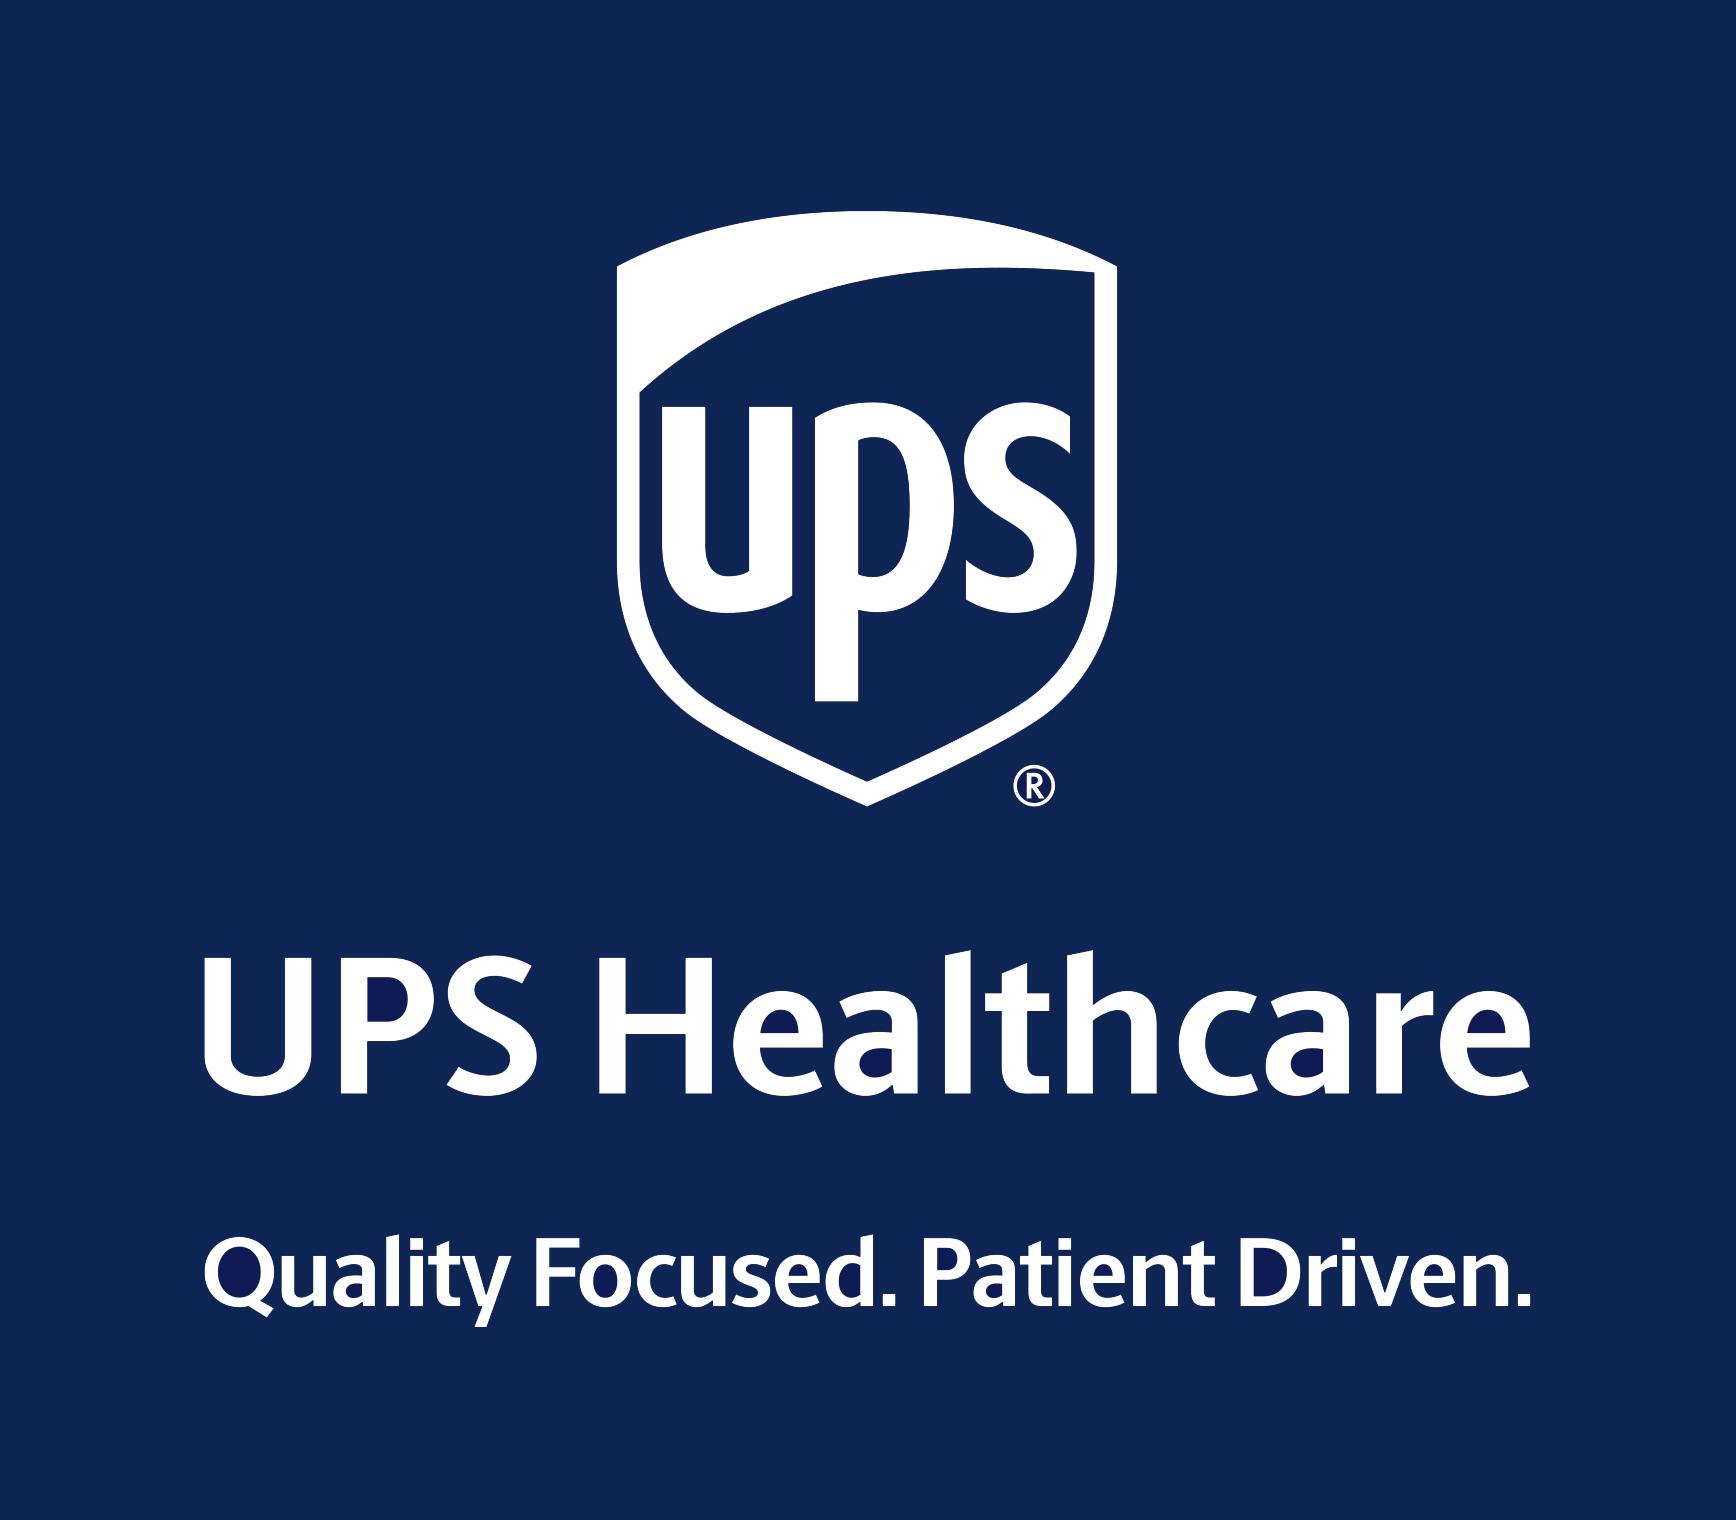 UPS_Healthcare-Logo-Primary-Vert-RGB-White-Tag_Line-Blue-BG.jpg